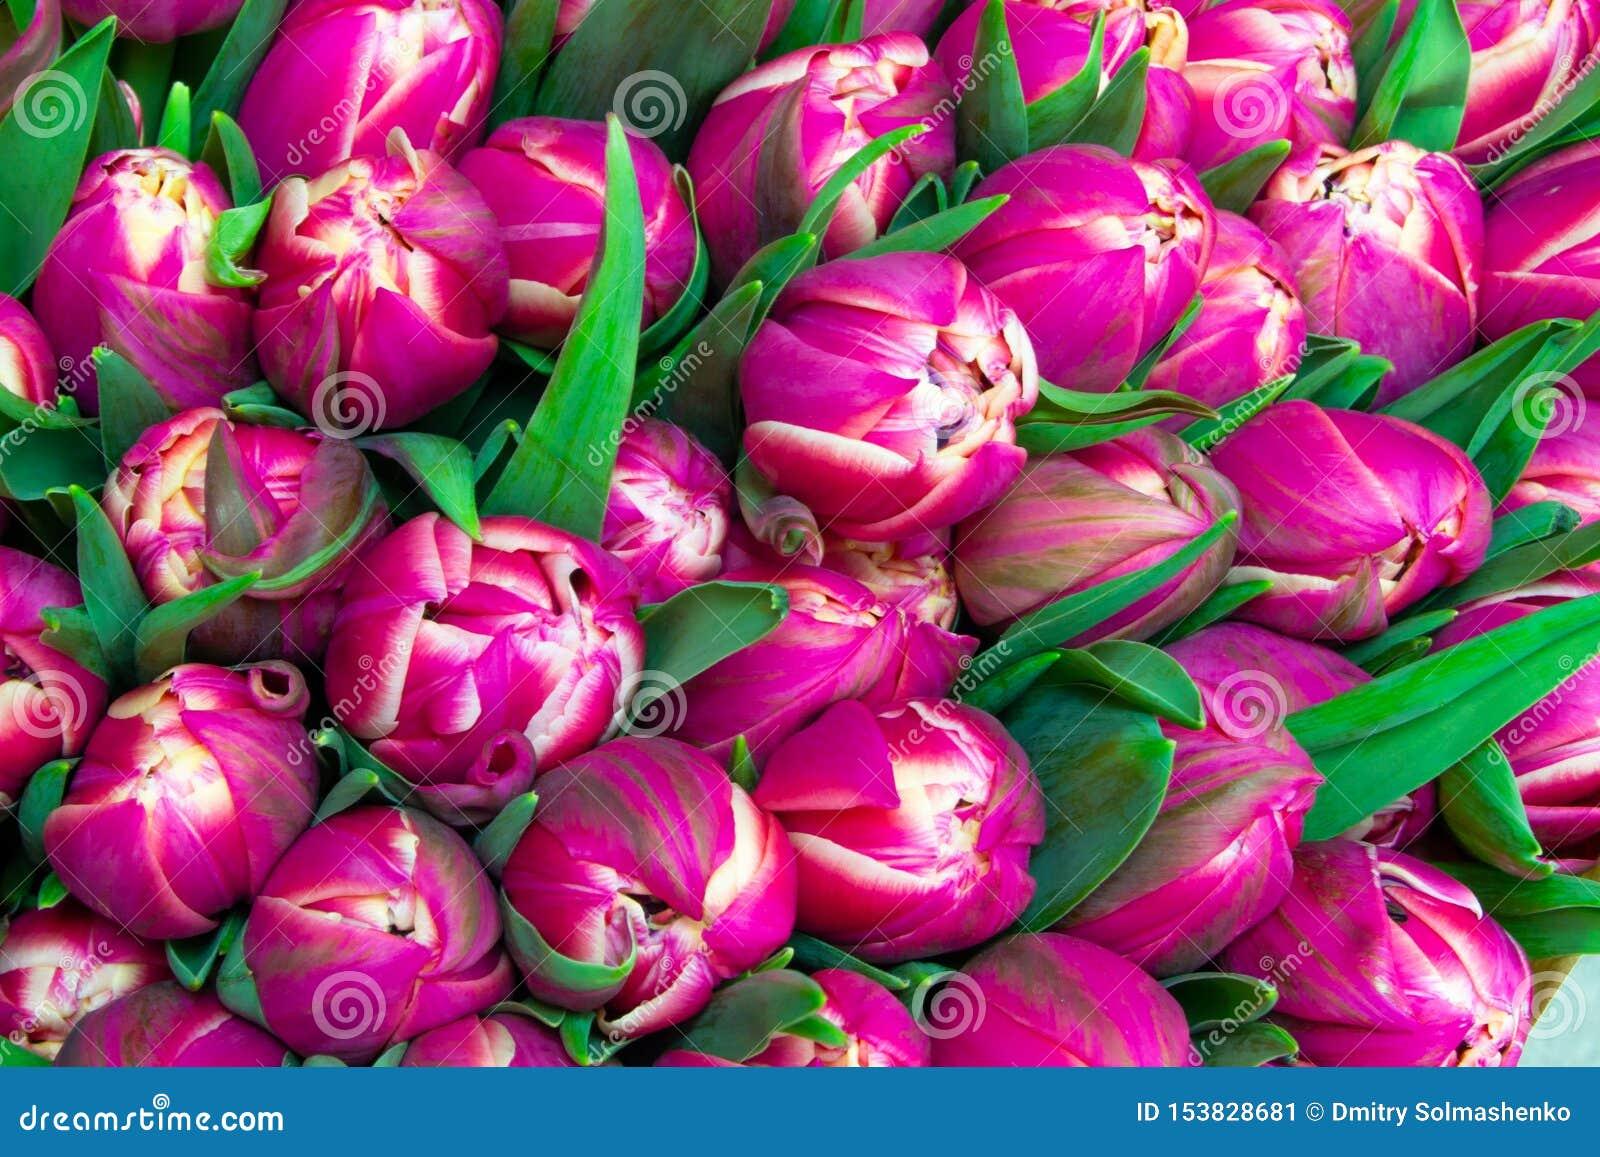 Vele roze tulpen sluiten omhoog bloemen roze achtergrond